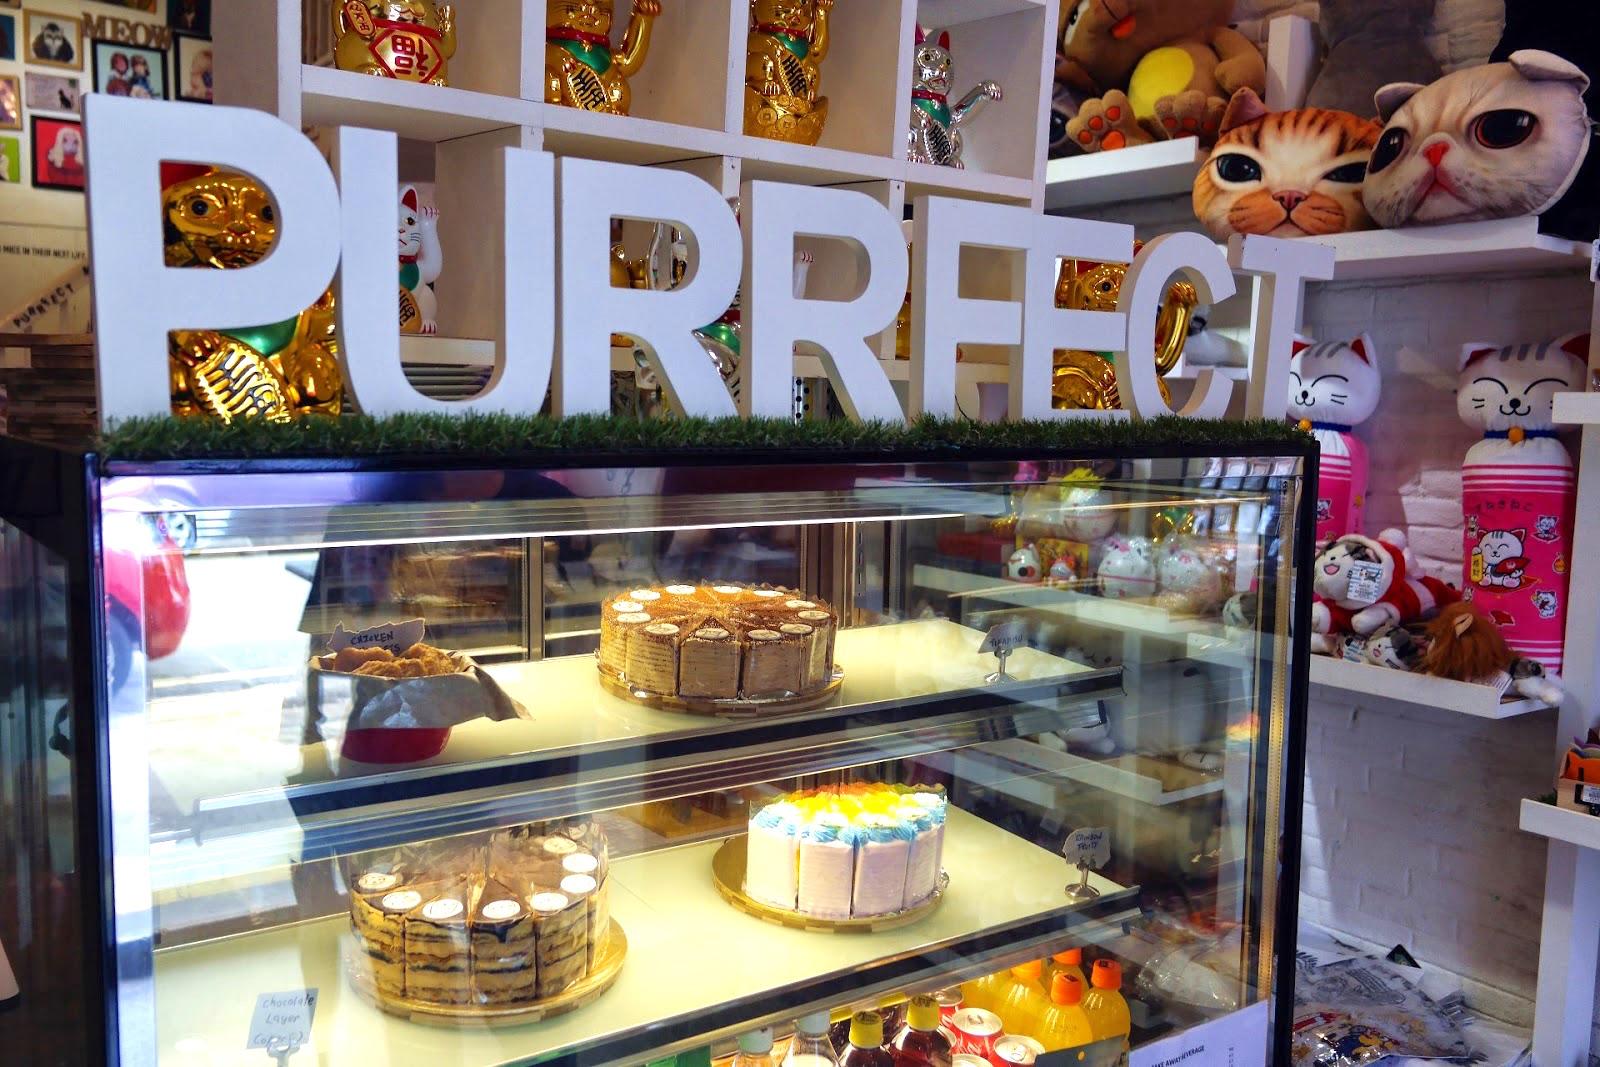 Purrfect Cat Cafe Penang - AspirantSG